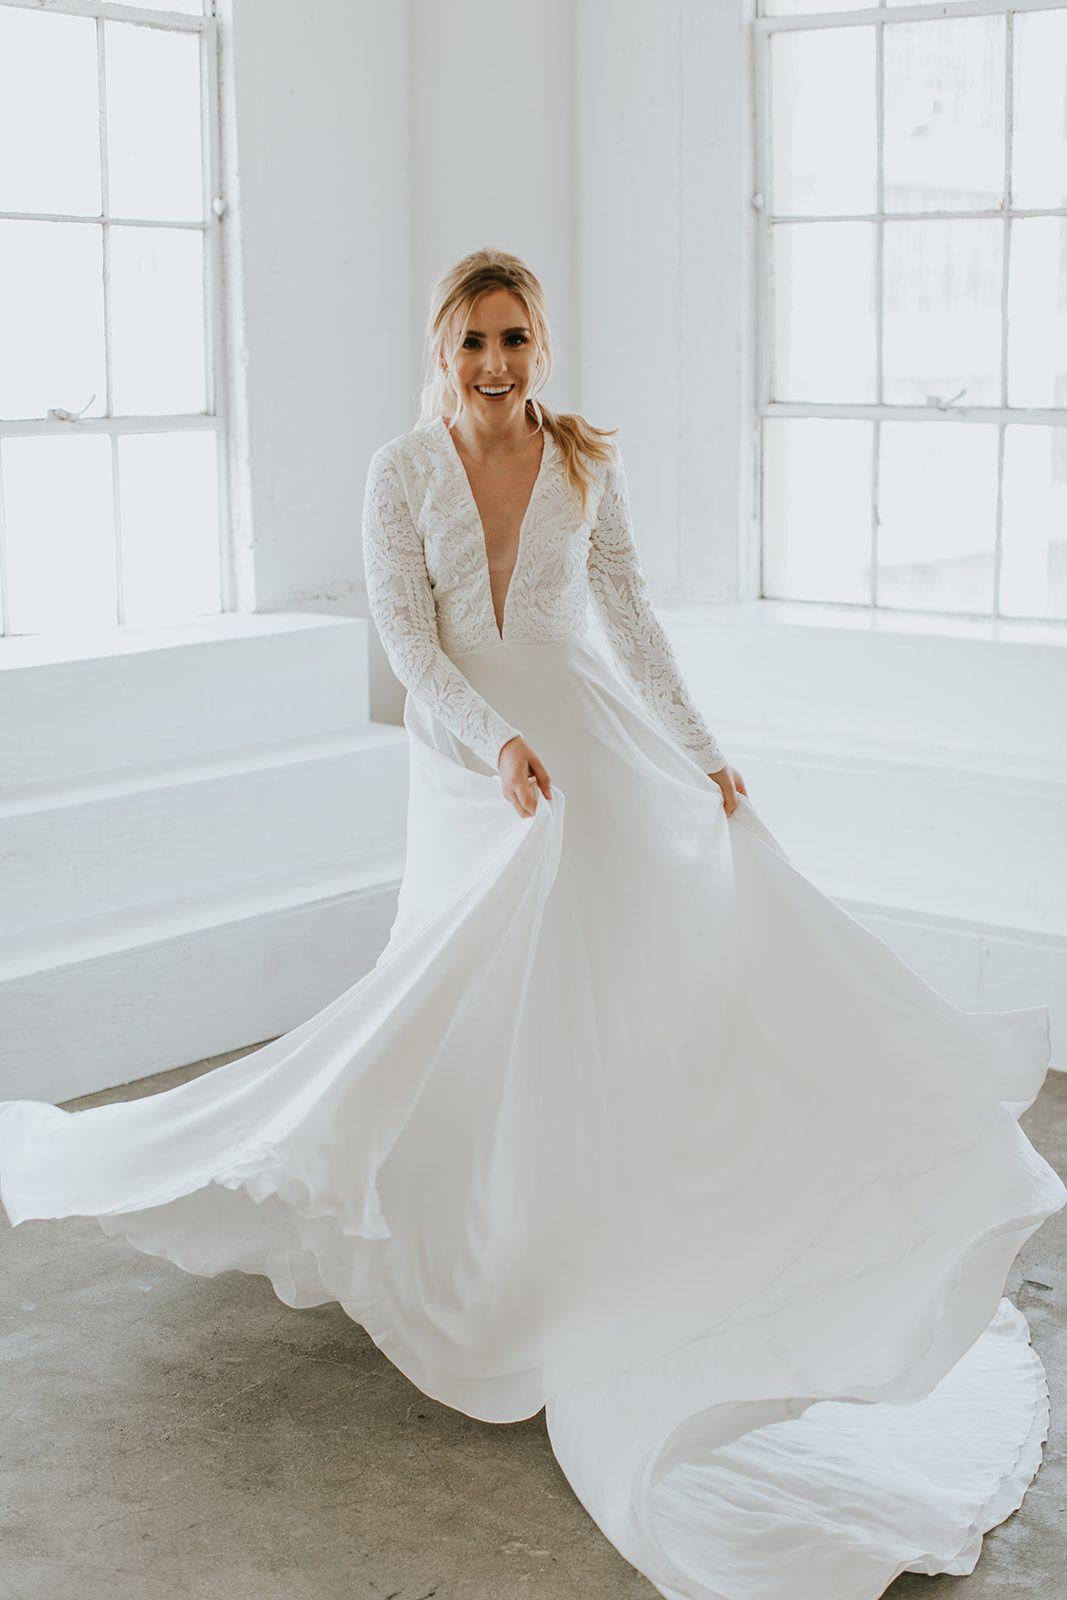 Long Sleeve Wedding Dress Kirsten Paige Bridal Wedding Dress Long Sleeve Designer Wedding Dresses Wedding Dresses [ 1600 x 1067 Pixel ]